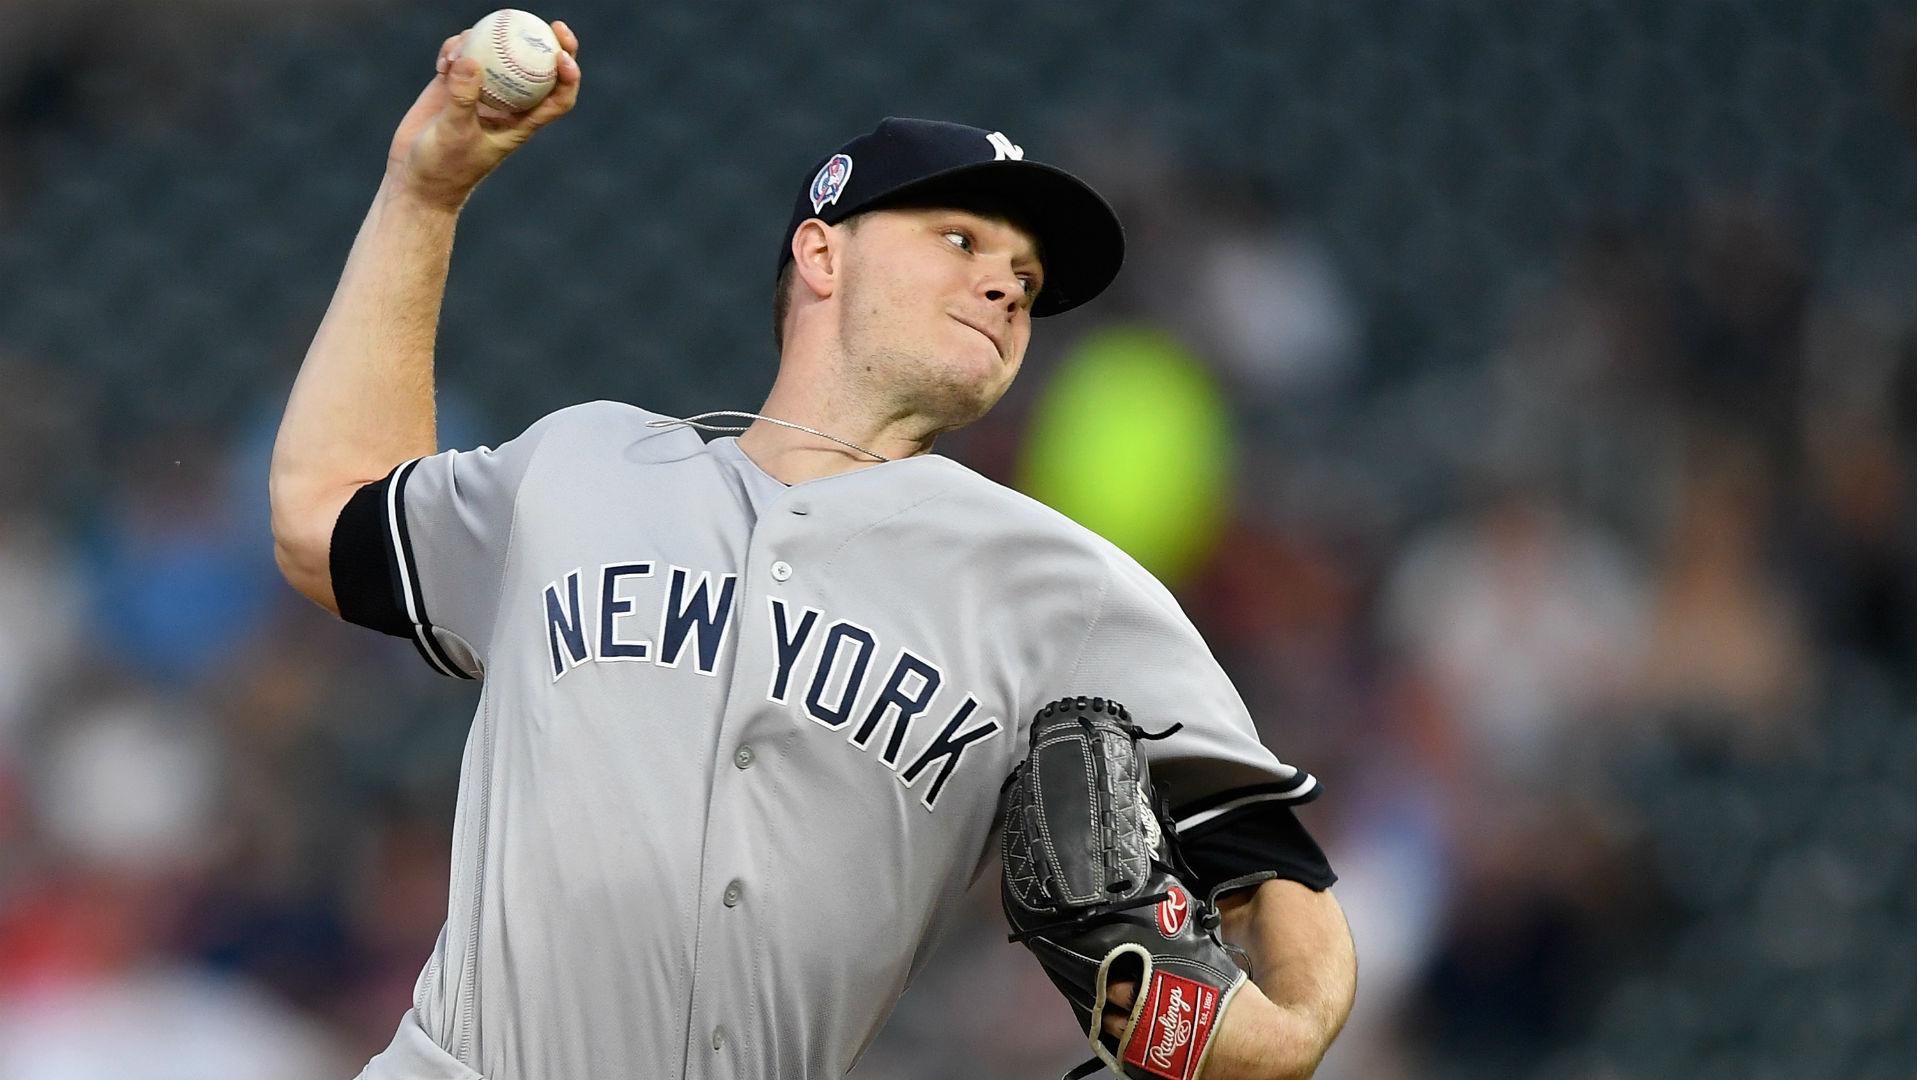 MLB trade rumors: Yankees 'close' to Sonny Gray deal